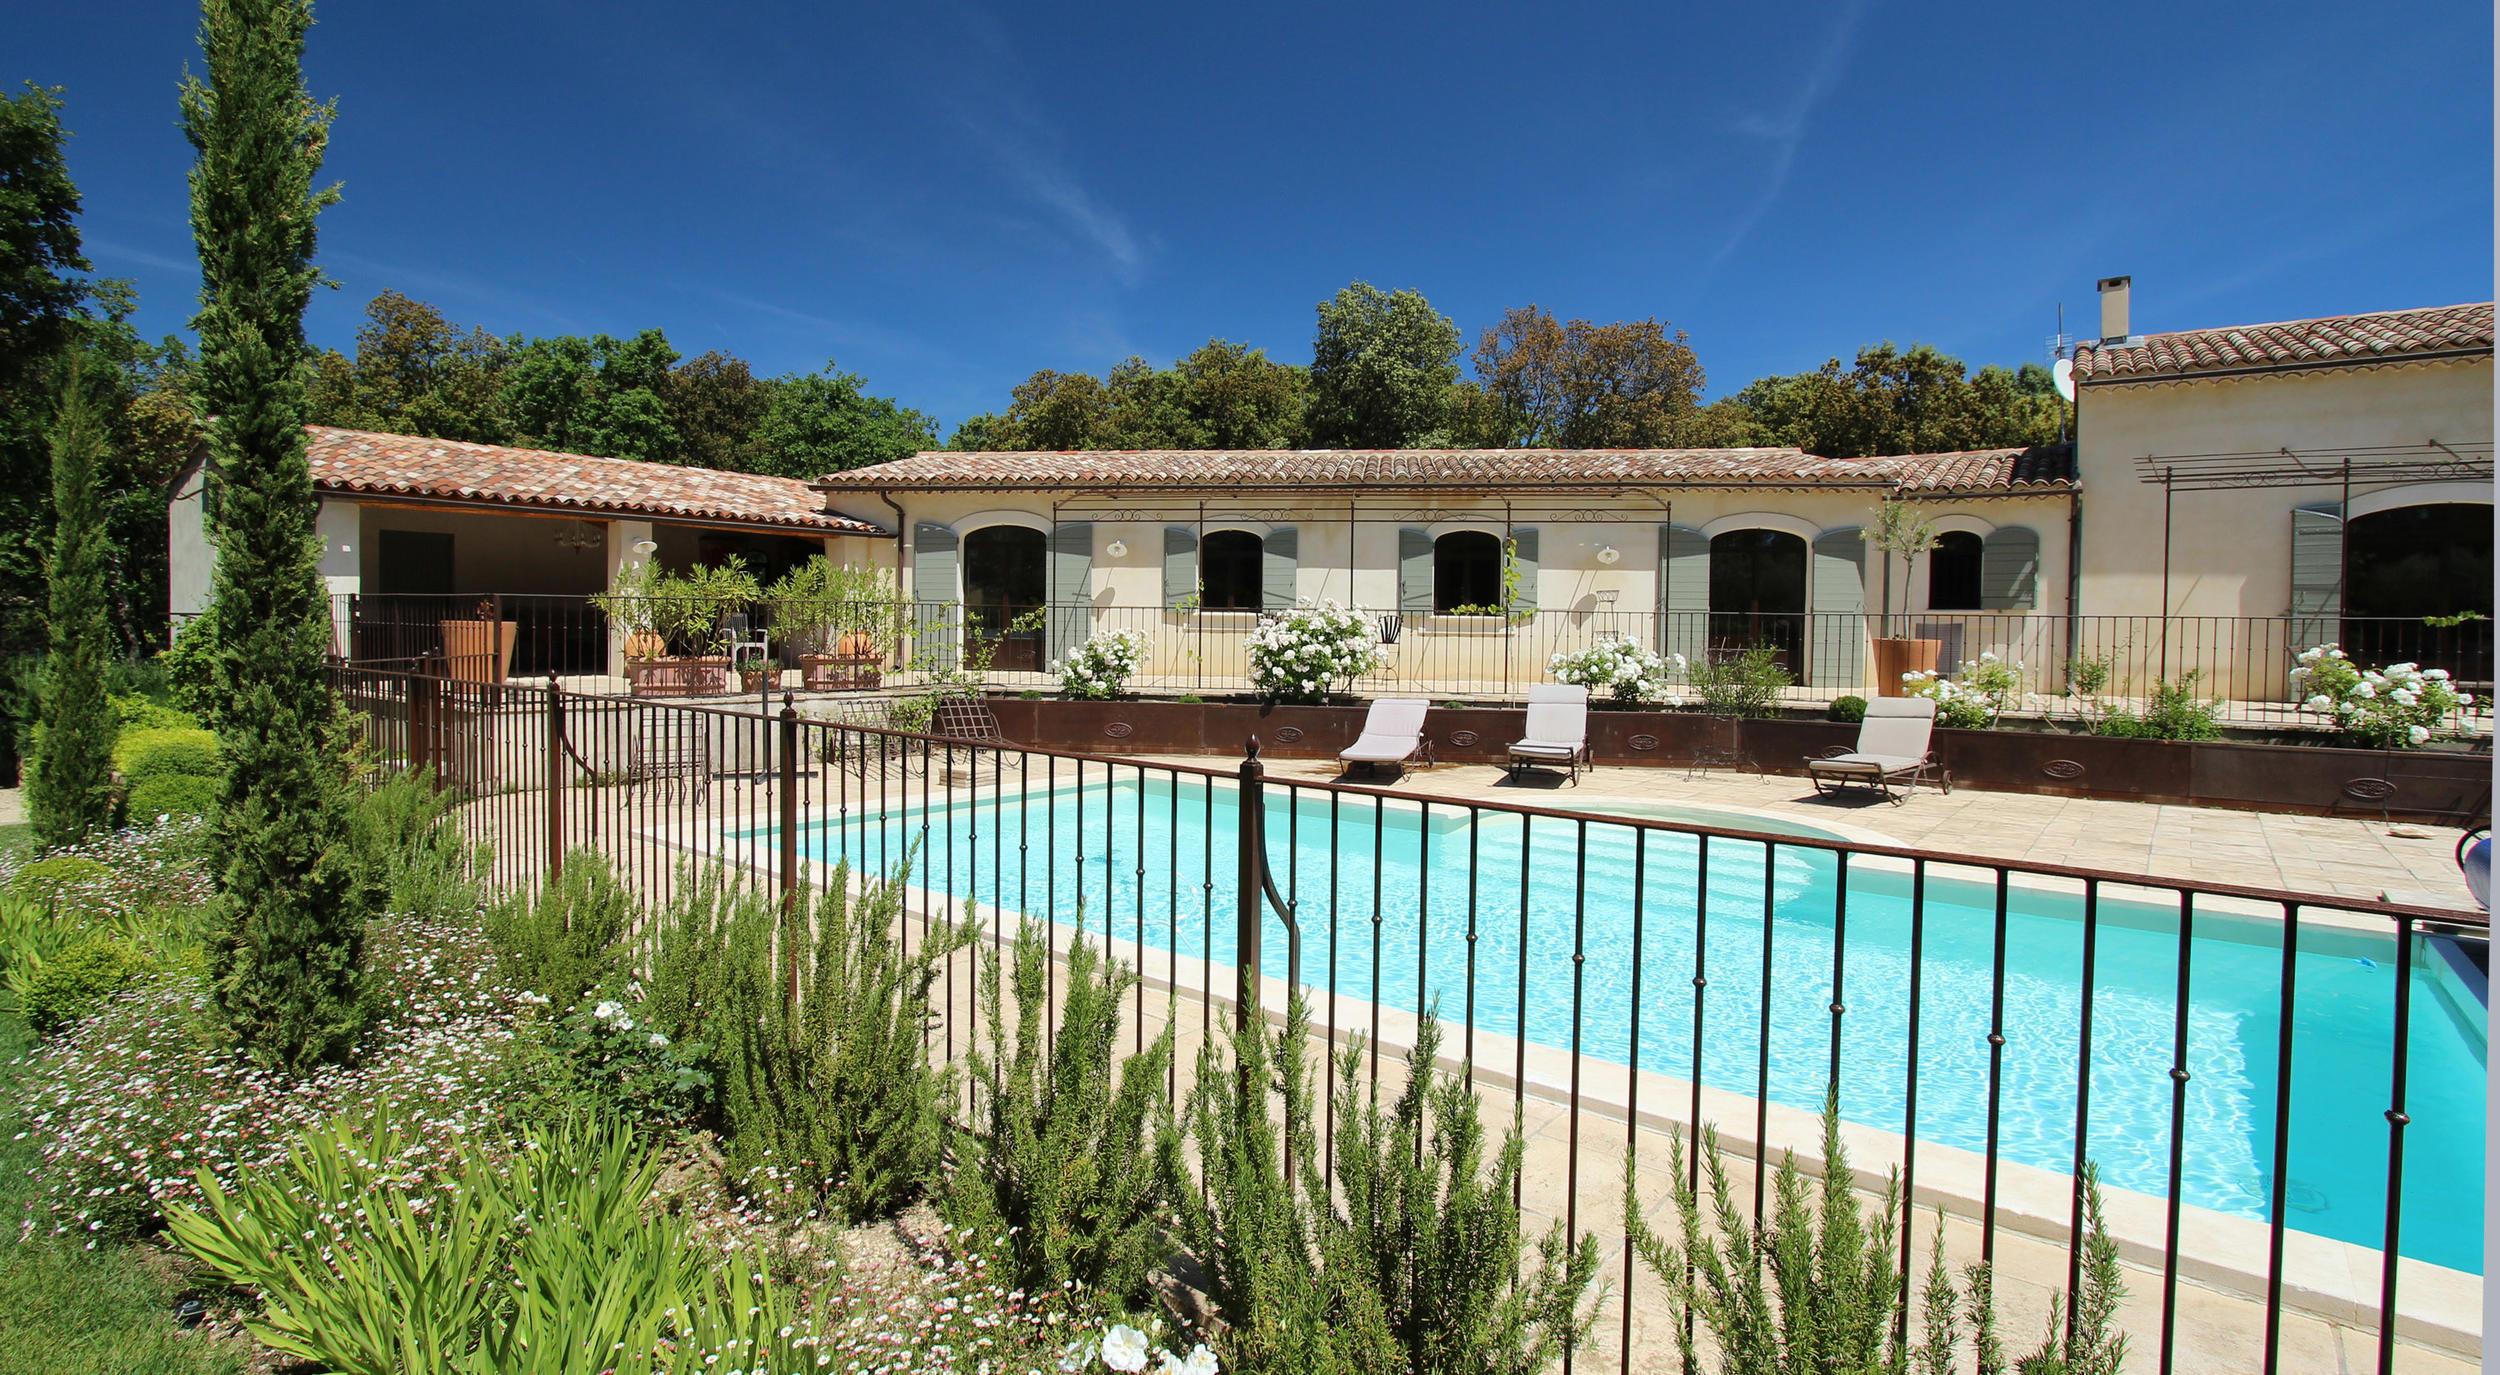 Maison a louer sud france avec piscine ventana blog - Location villa collioure avec piscine ...